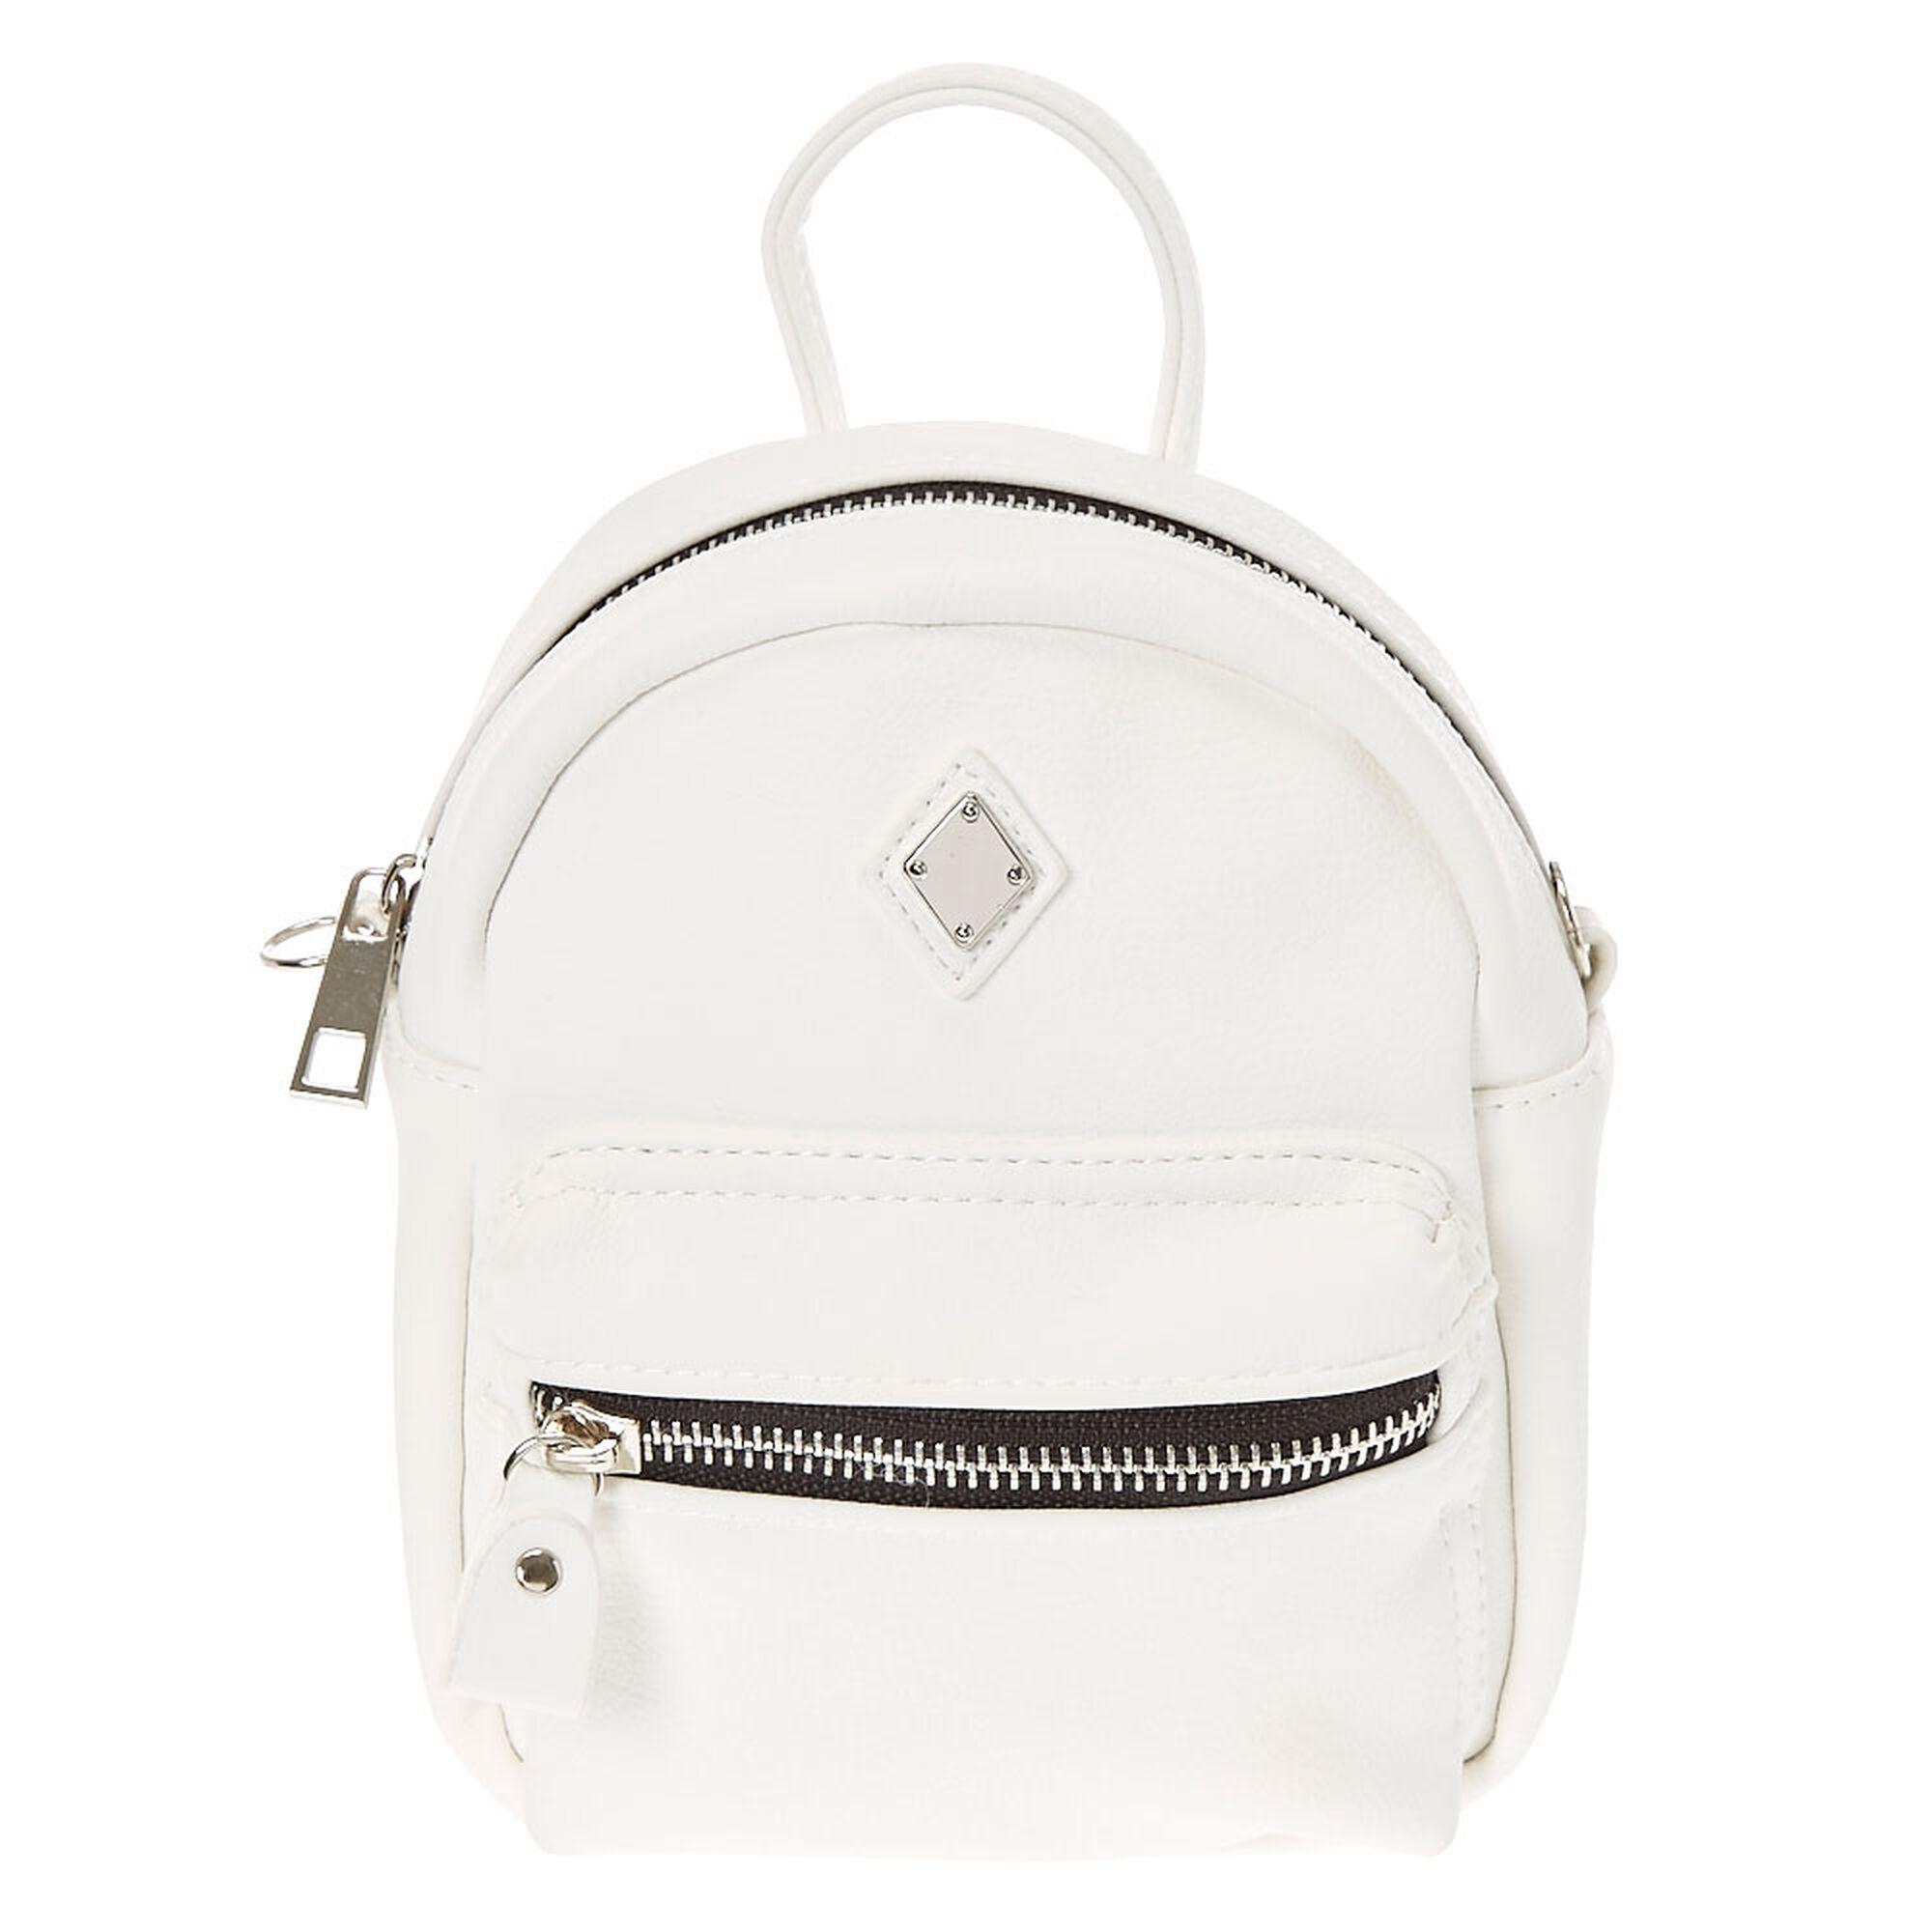 mini sac dos faux cuir blanc claire 39 s fr. Black Bedroom Furniture Sets. Home Design Ideas